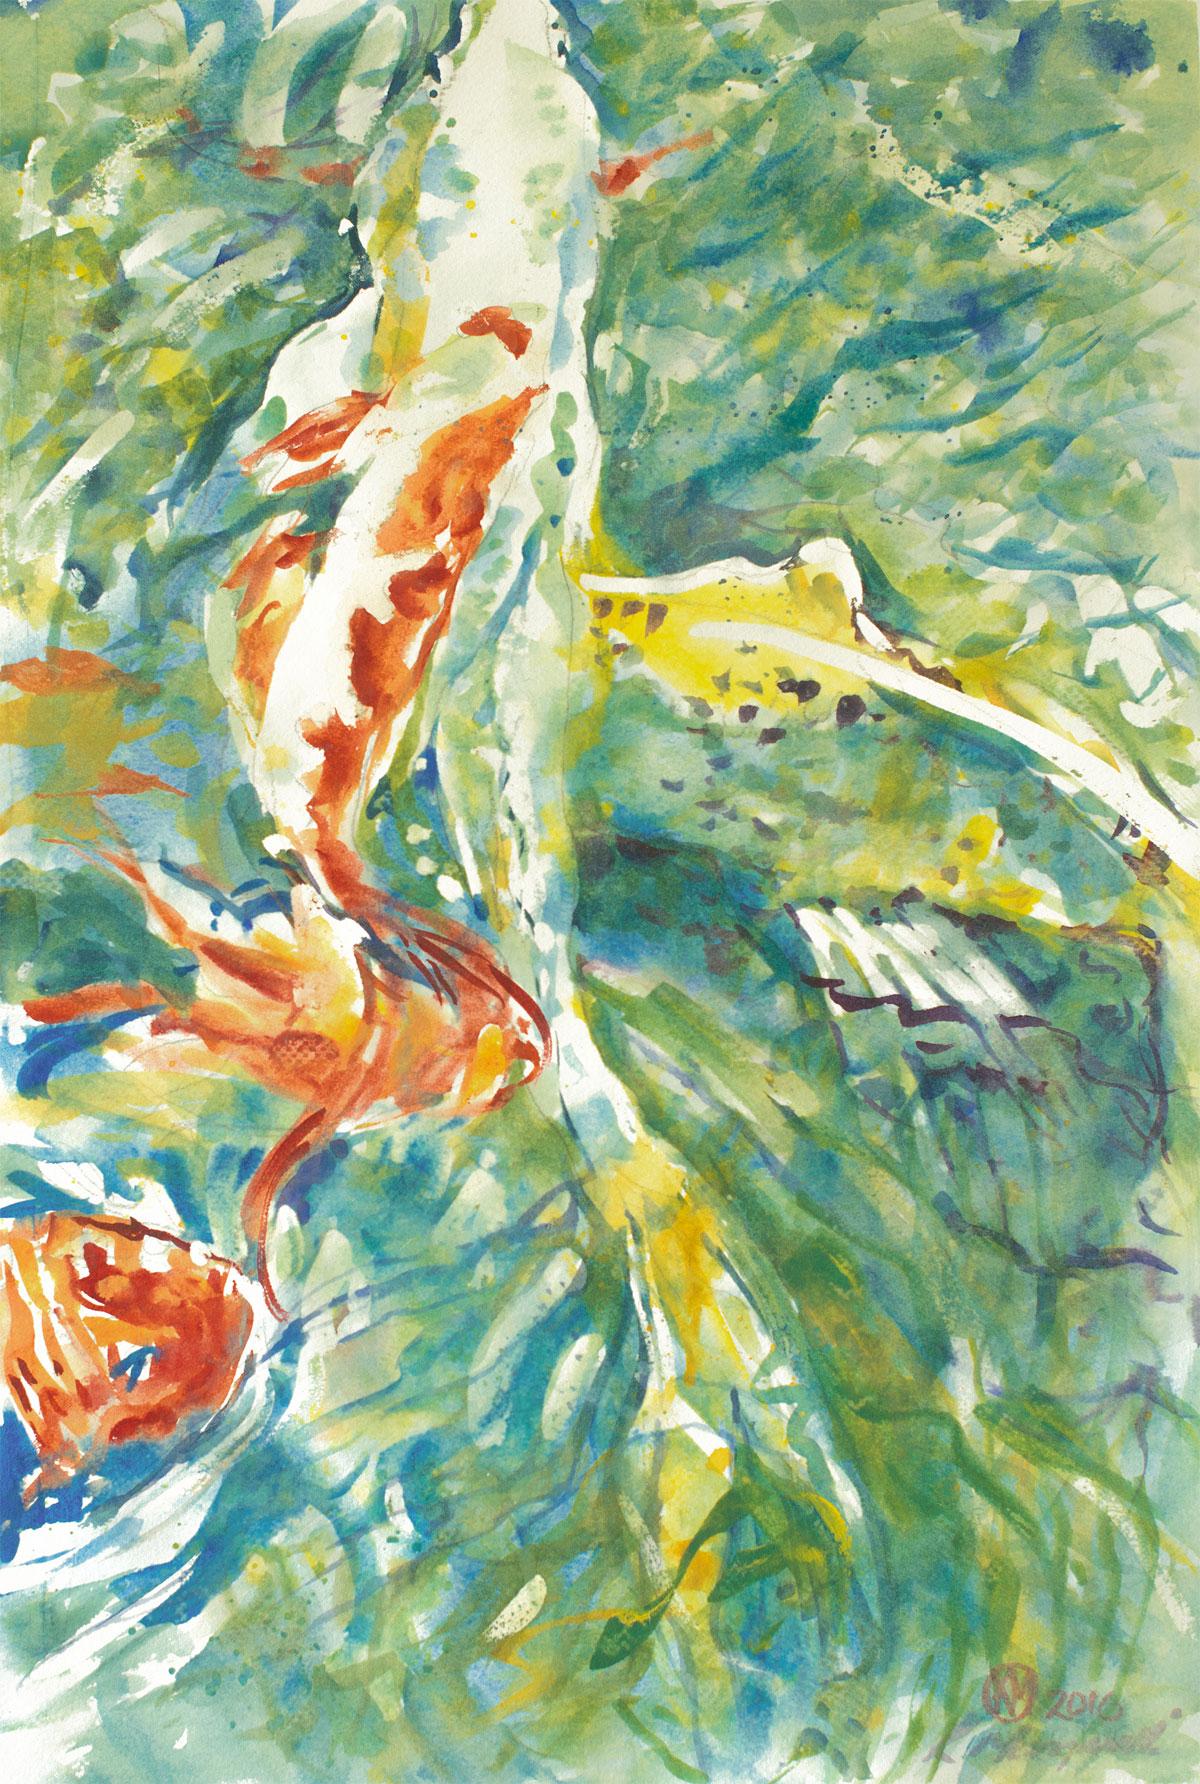 Koi pond art by kathryn morganelli for Koi fish pond art